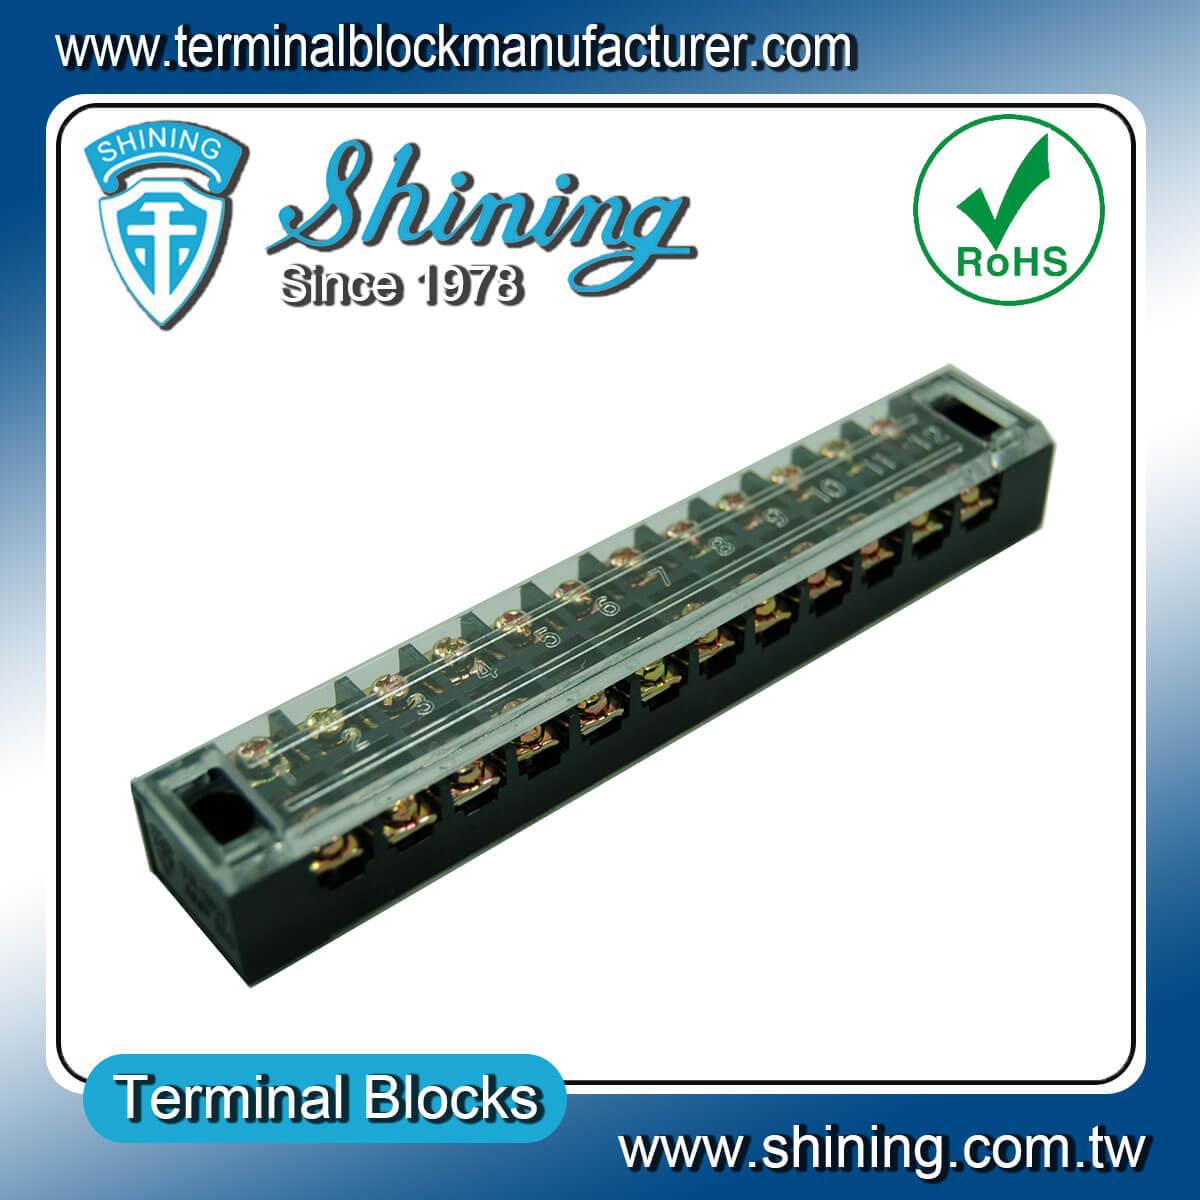 TB-1512 600V 15A 12Pole固定式柵欄端子台